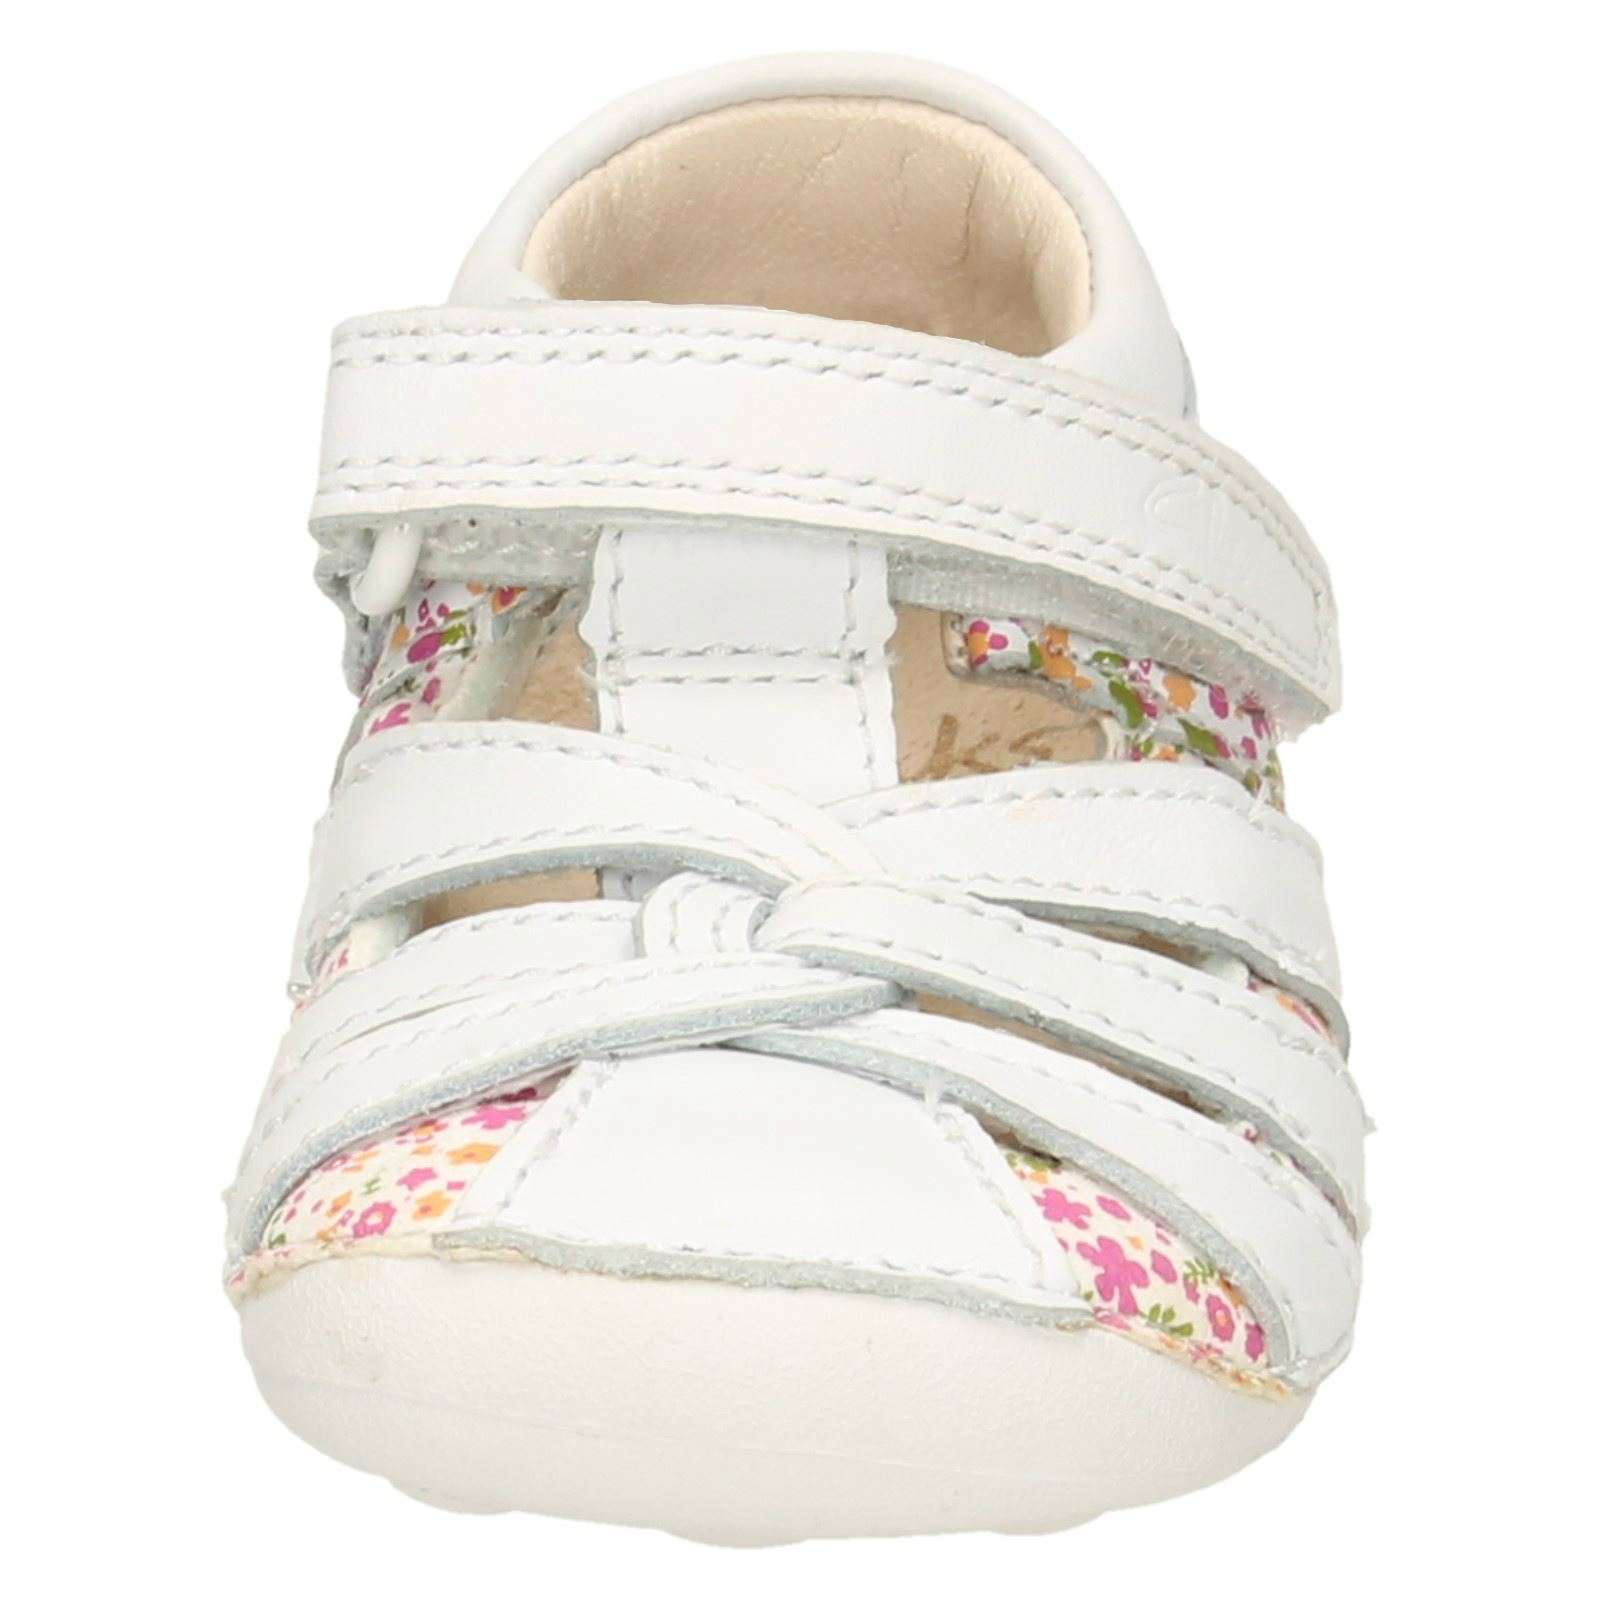 Clarks Girls Cruiser Shoes Little Mae